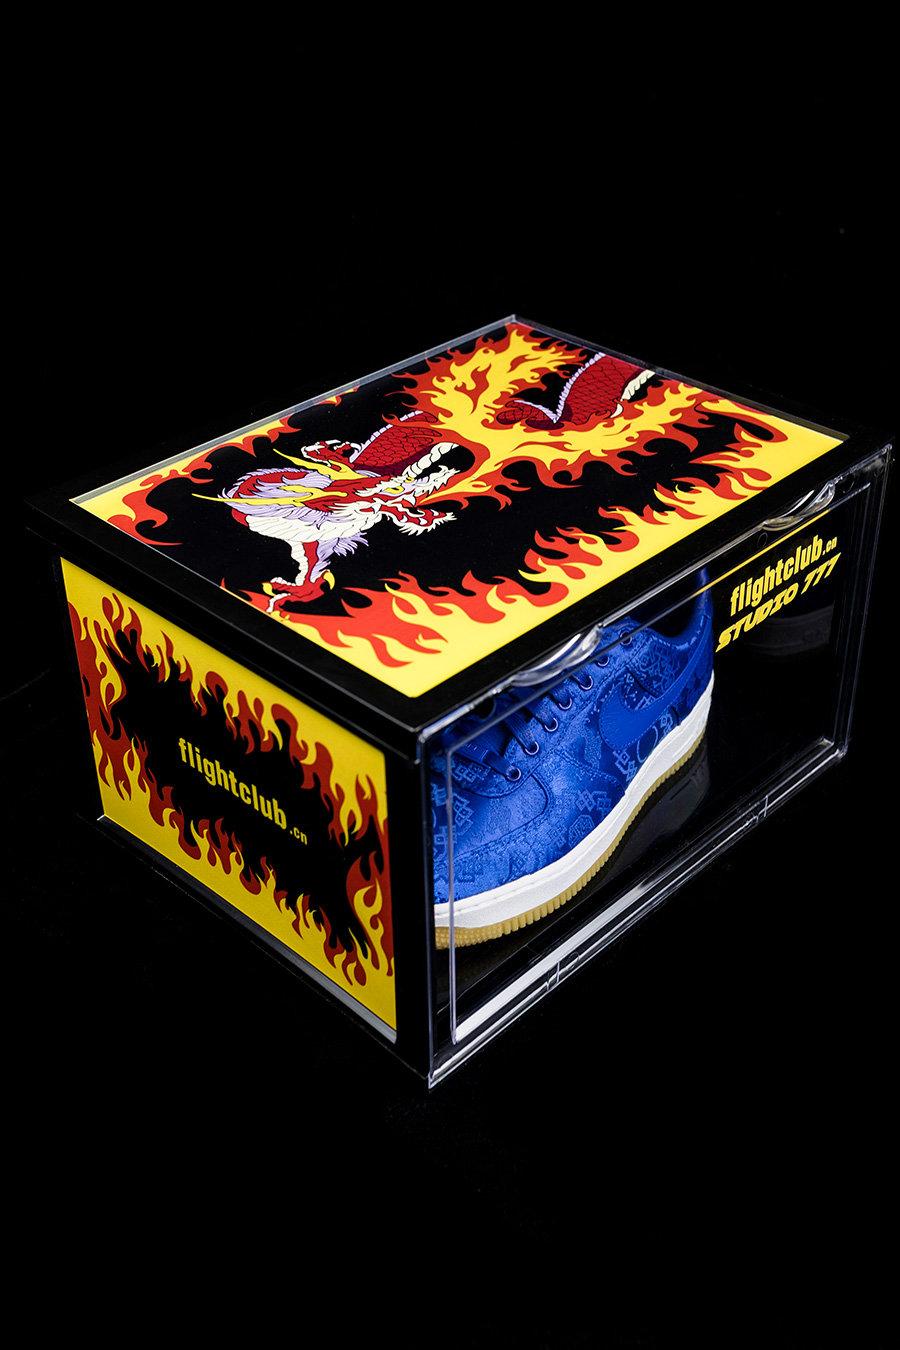 CLEAN ONE,鞋盒 ¥19 买 FC「火焰神龙」三方联名鞋盒!手慢无!